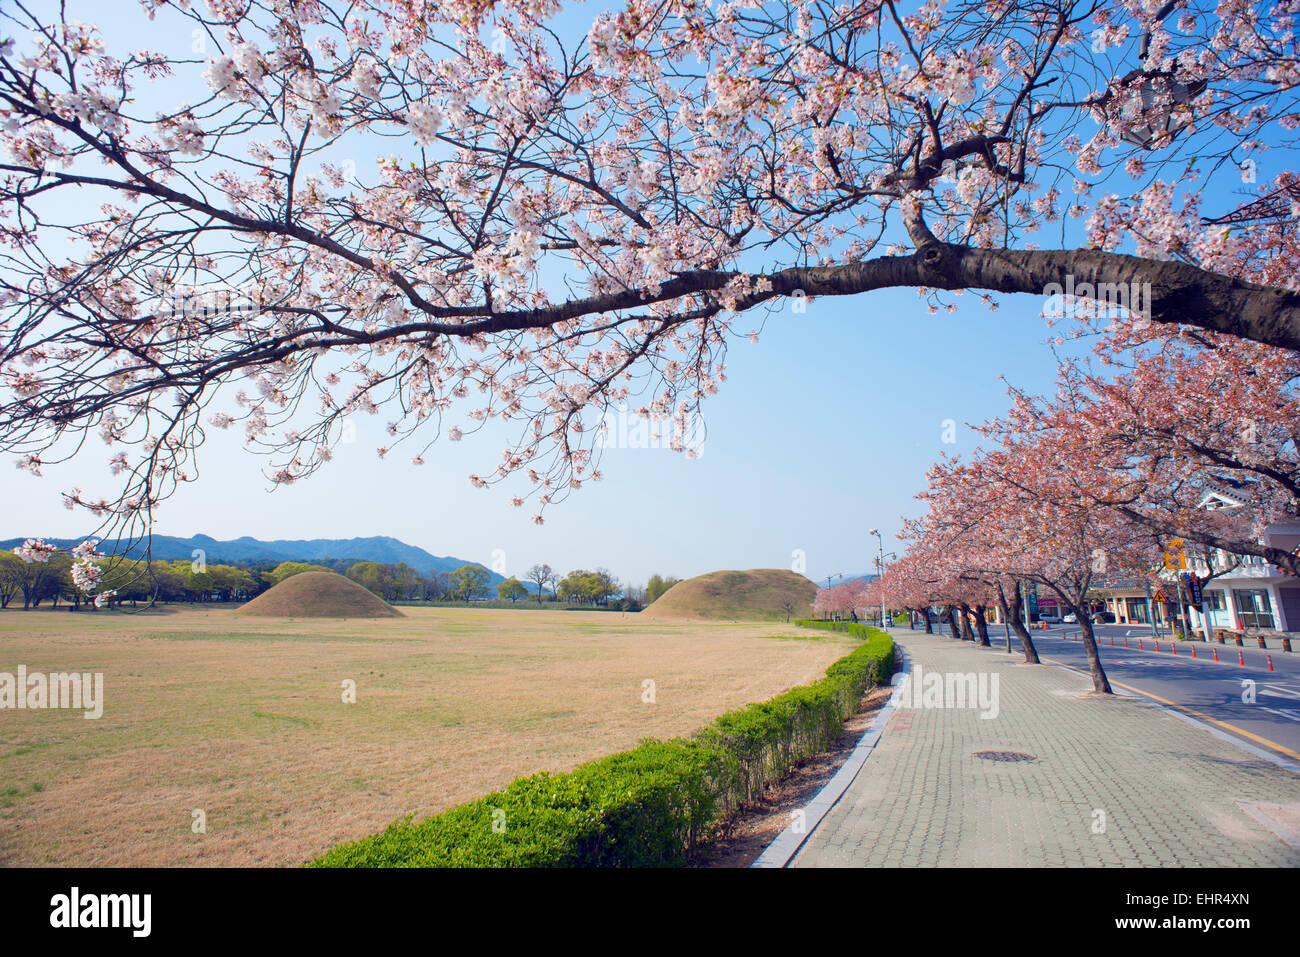 Asia, Republic of Korea, South Korea, Gyeongsangbuk-do, Gyeongju, Royal Tombs burial mounds, Unesco site Stock Photo